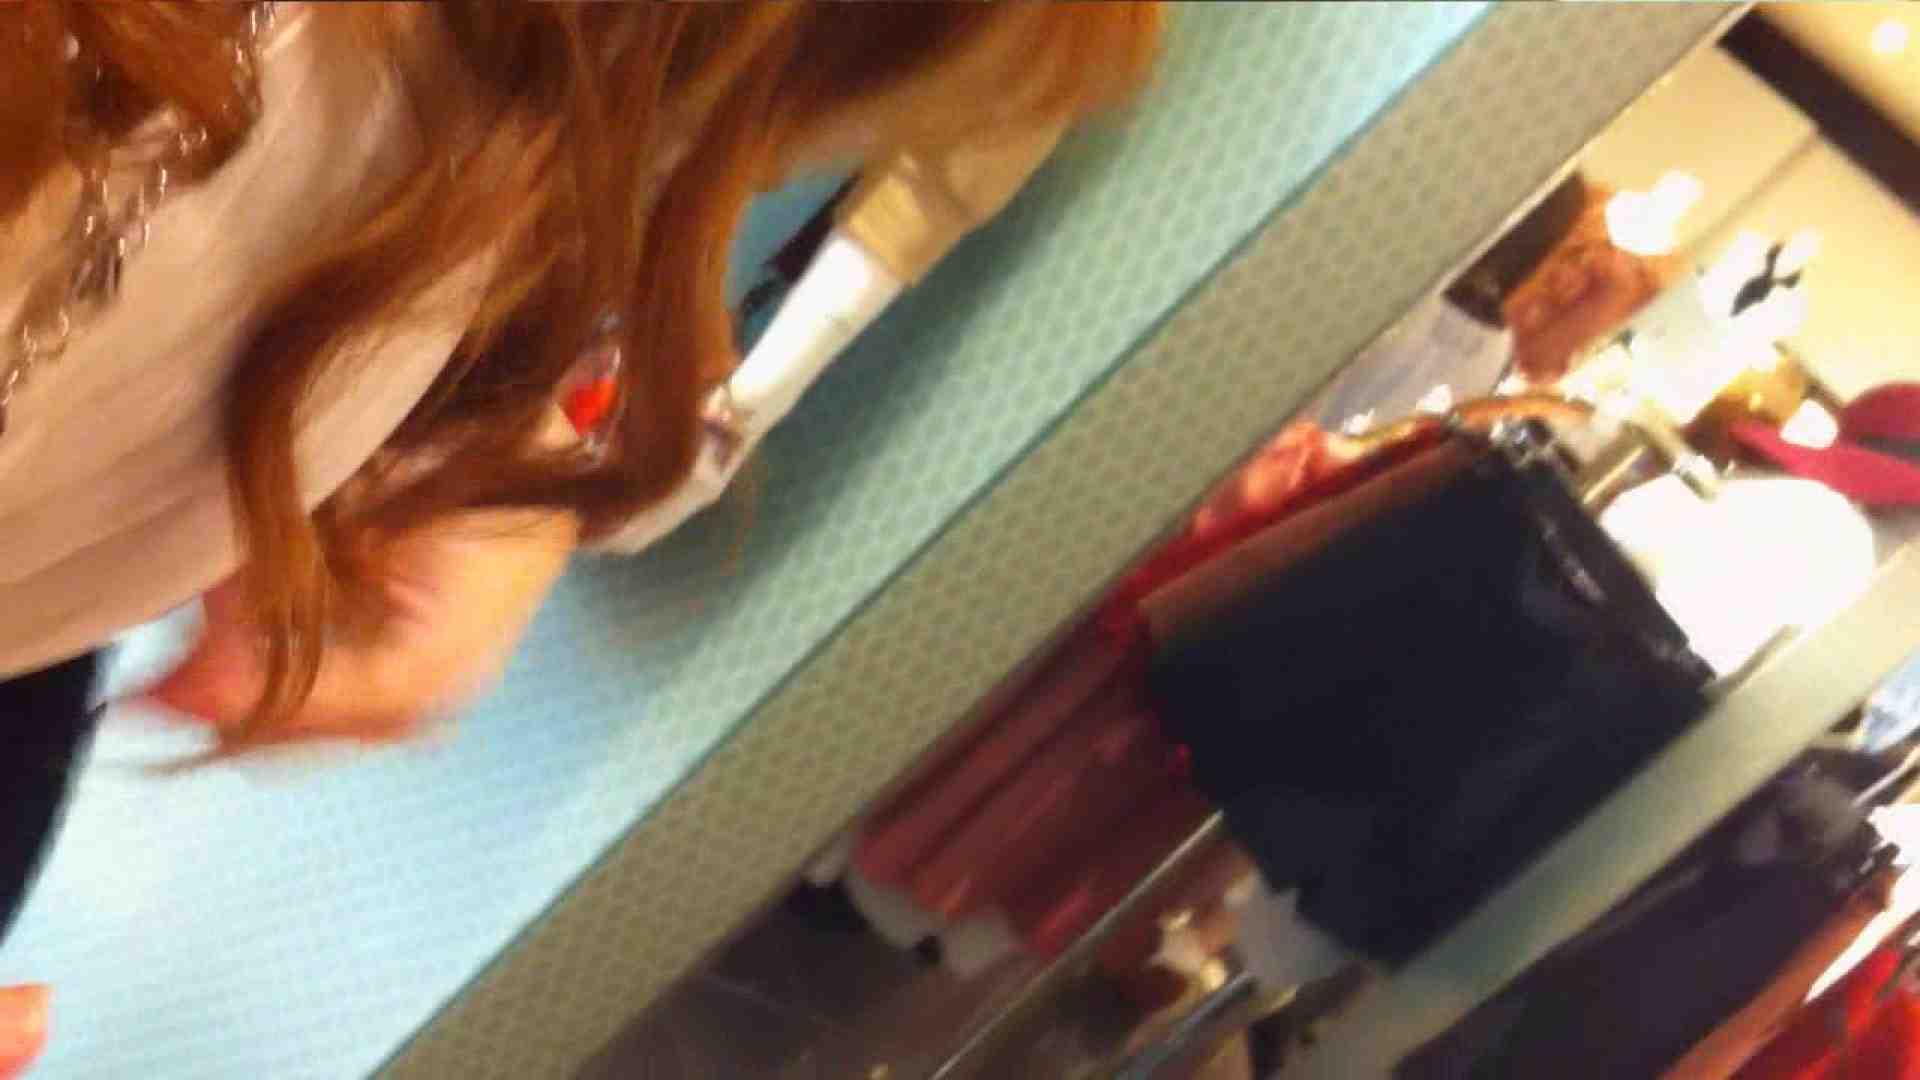 vol.35 美人アパレル胸チラ&パンチラ ひらひらスカートの中身は? 胸チラ 隠し撮りすけべAV動画紹介 108画像 89